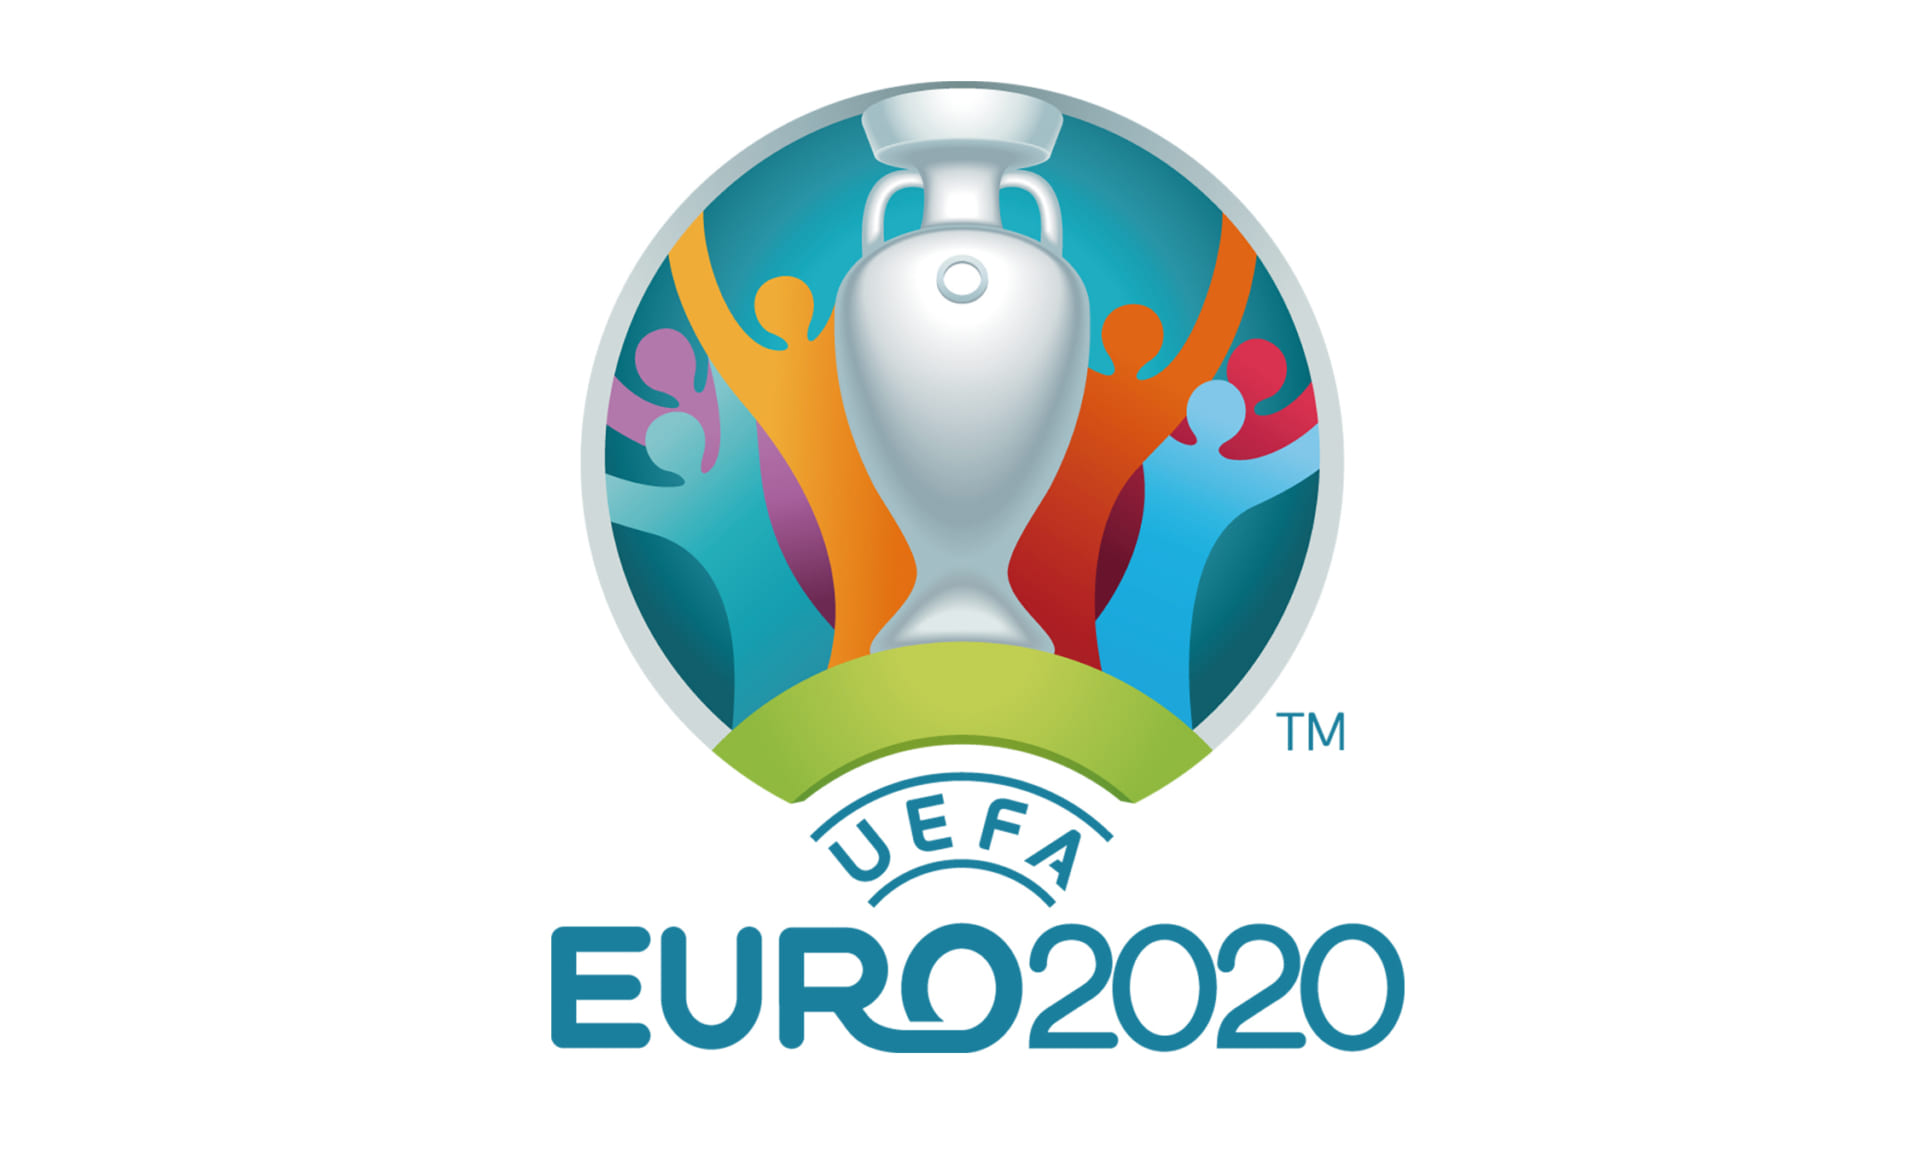 WOWOWで「UEFA EURO 2020TM サッカー欧州選手権 ~The final tournament draw~」が放送決定